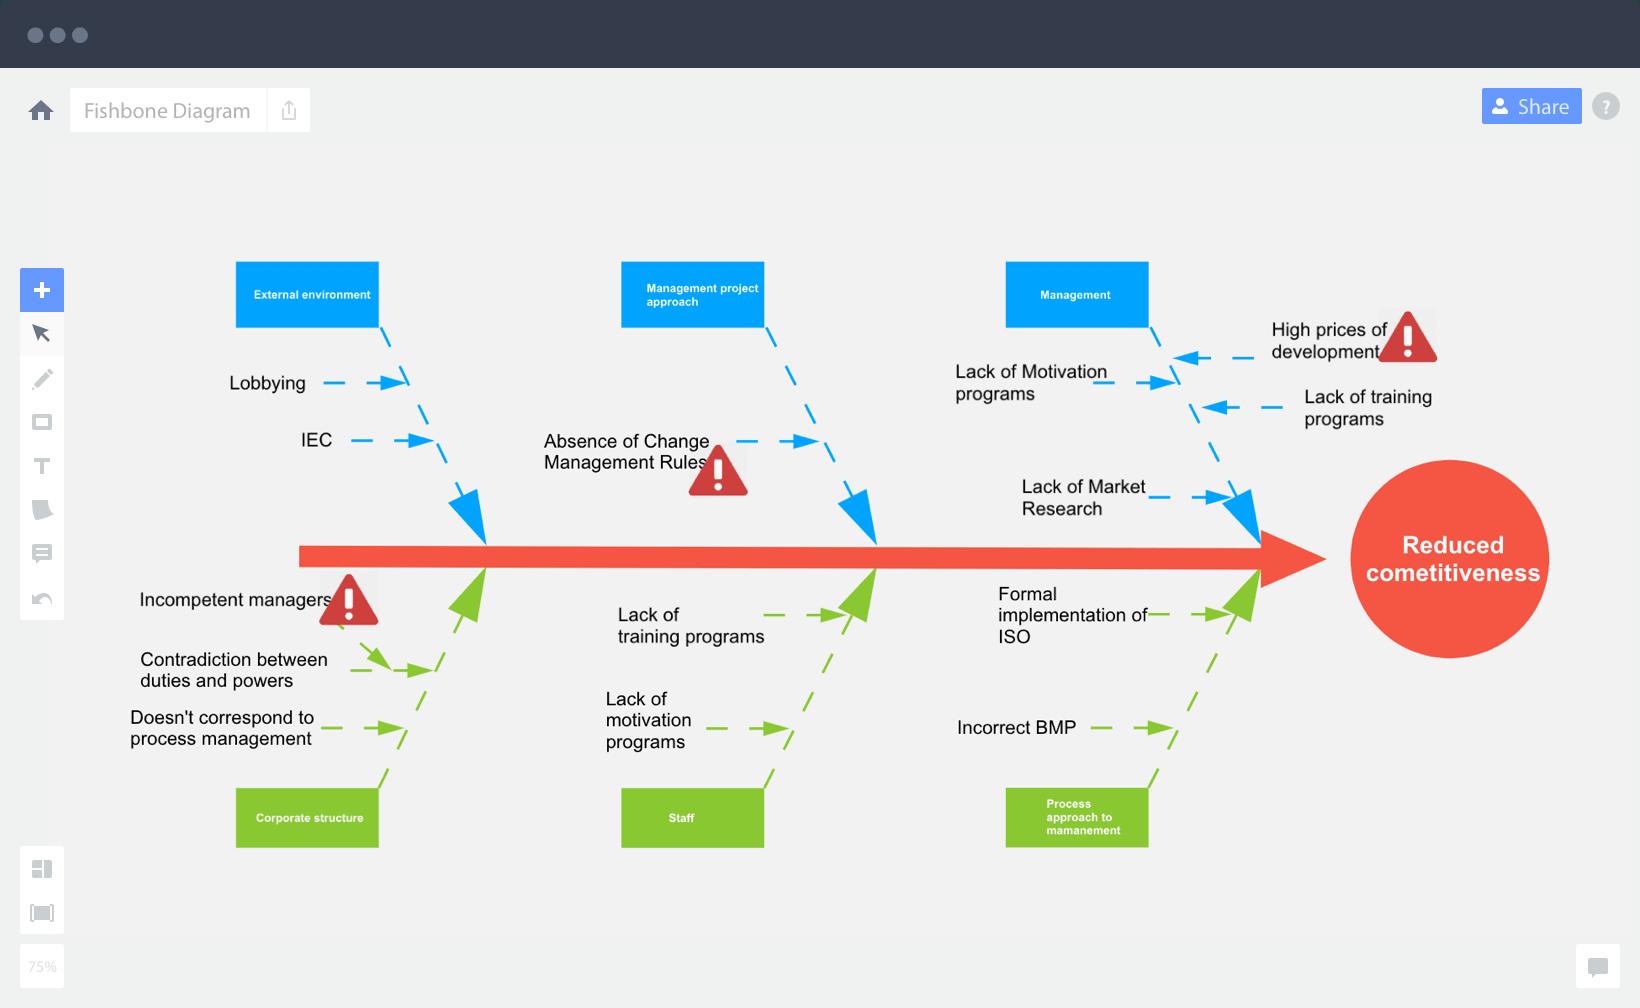 Miro Software - Fishbone diagram